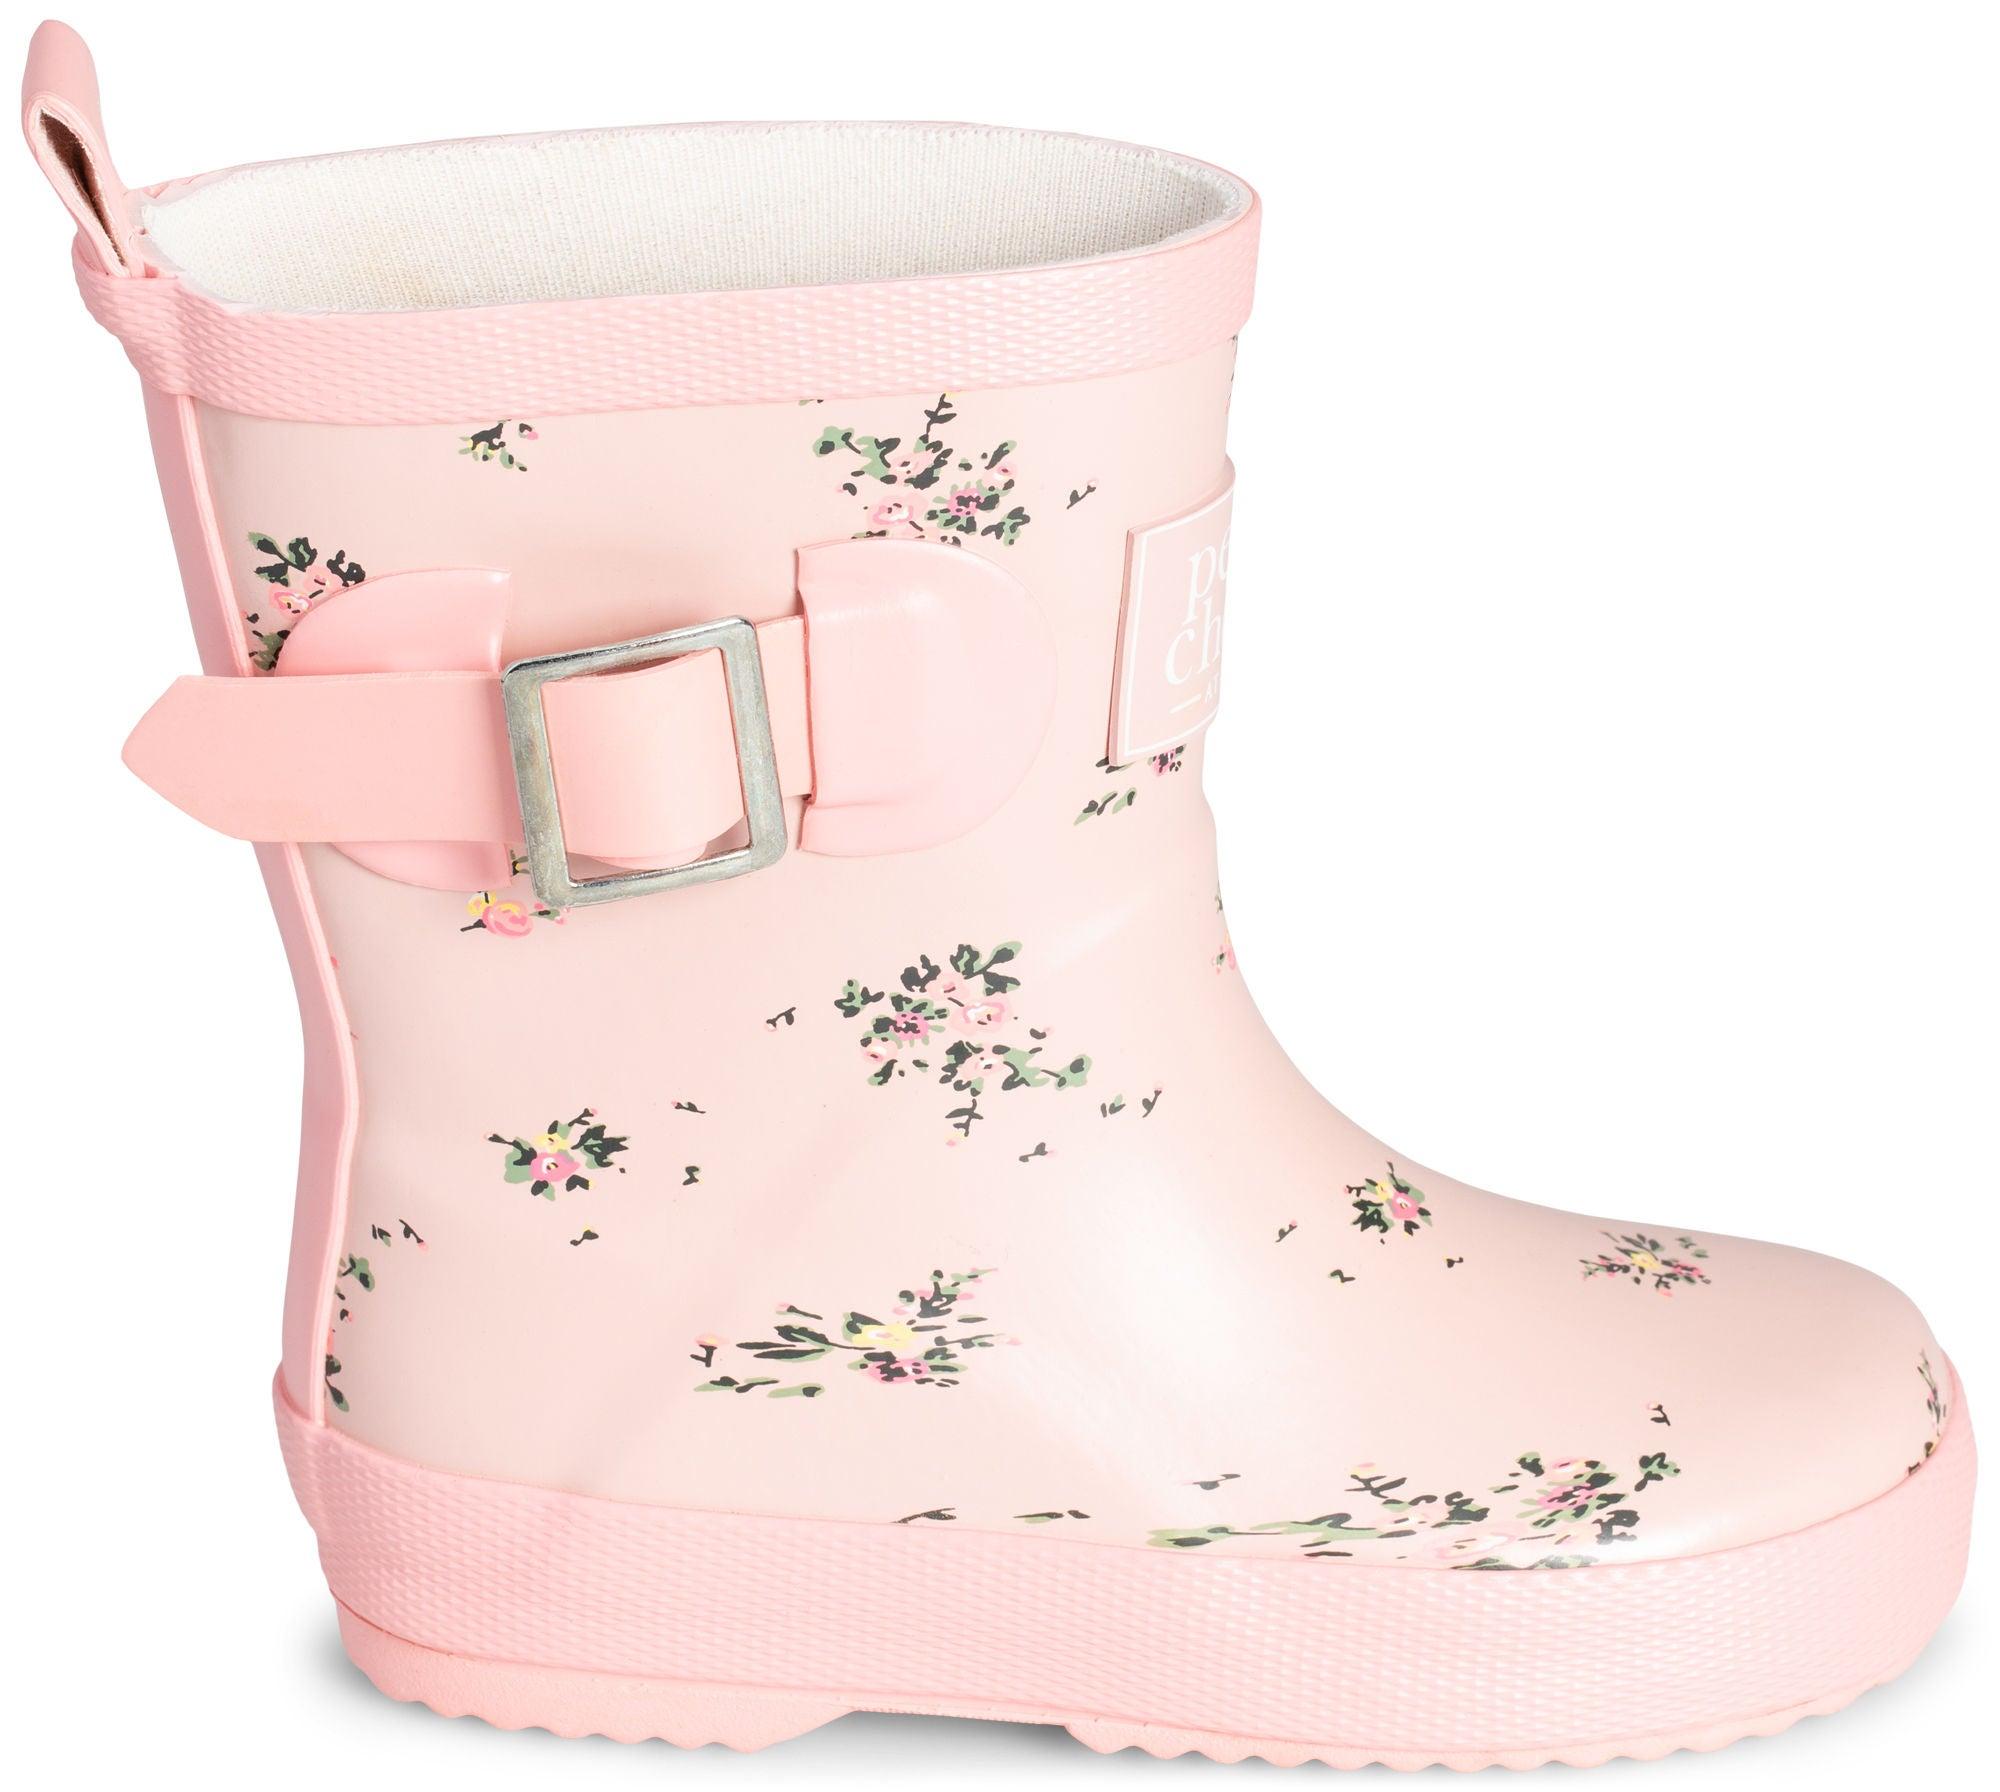 d3c5403a81f Petite Chérie Atelier Lea Gummistøvel, Pink/Wildflower